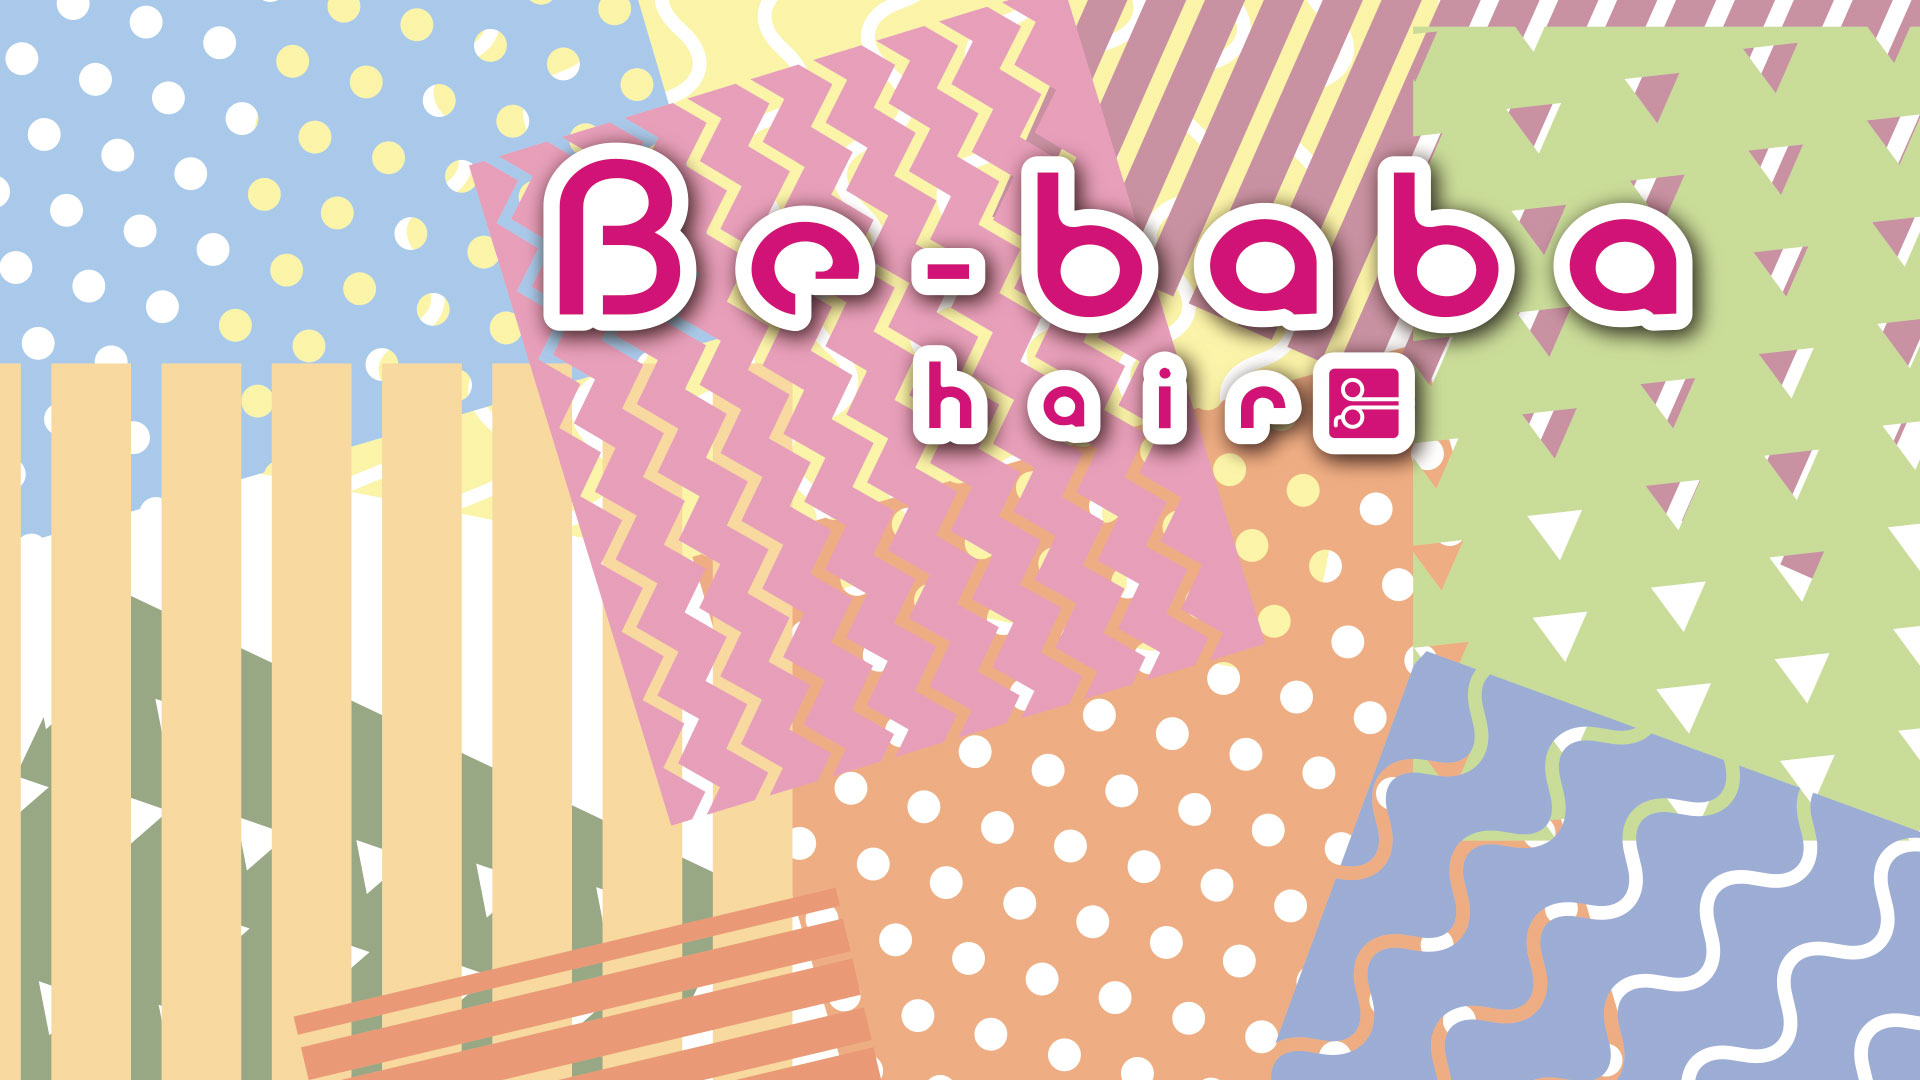 Be-babaicon